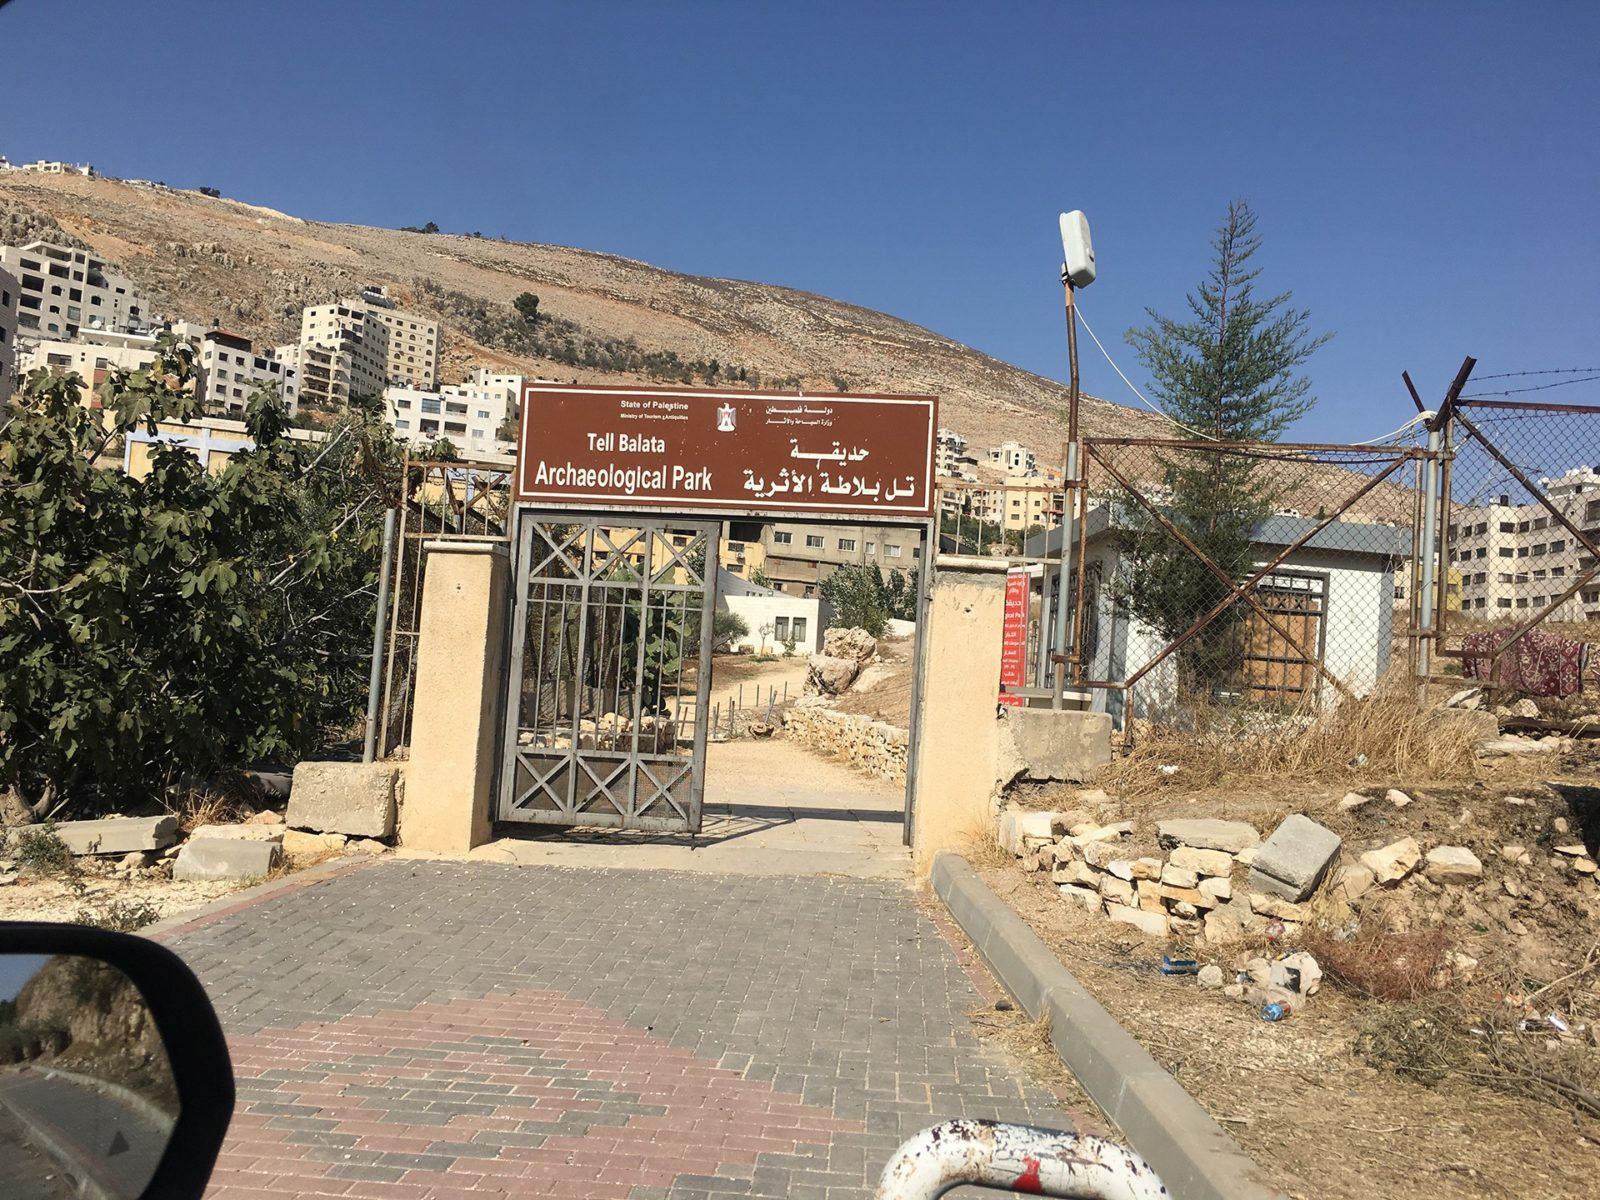 Entrance to Tel Balata Archaeological Park, Nablus